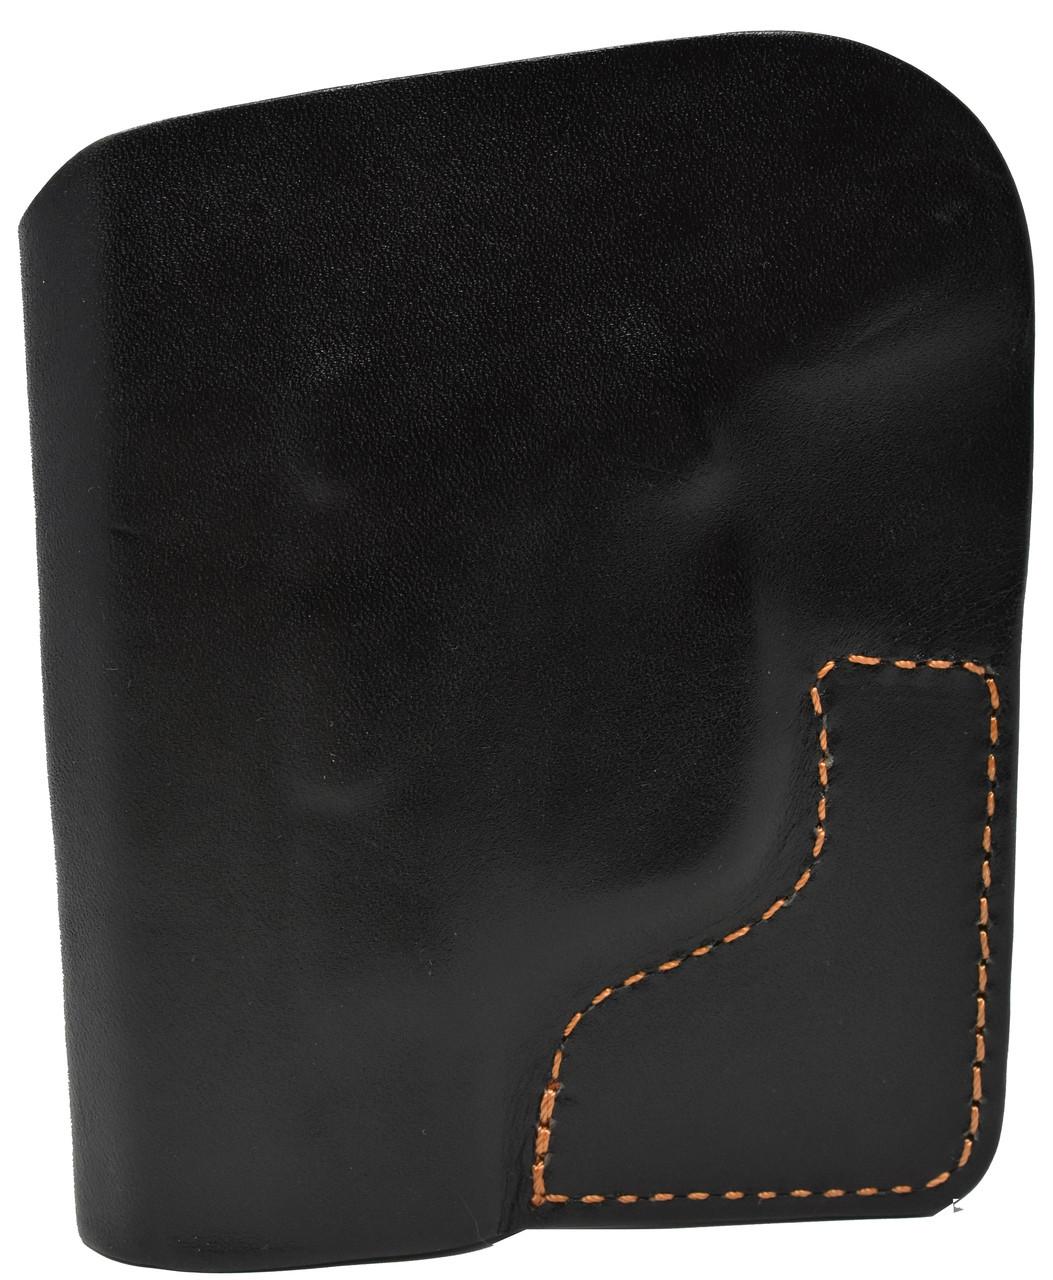 Black Italian Leather Pocket Holster for Kahr PM 9 and Similar Guns